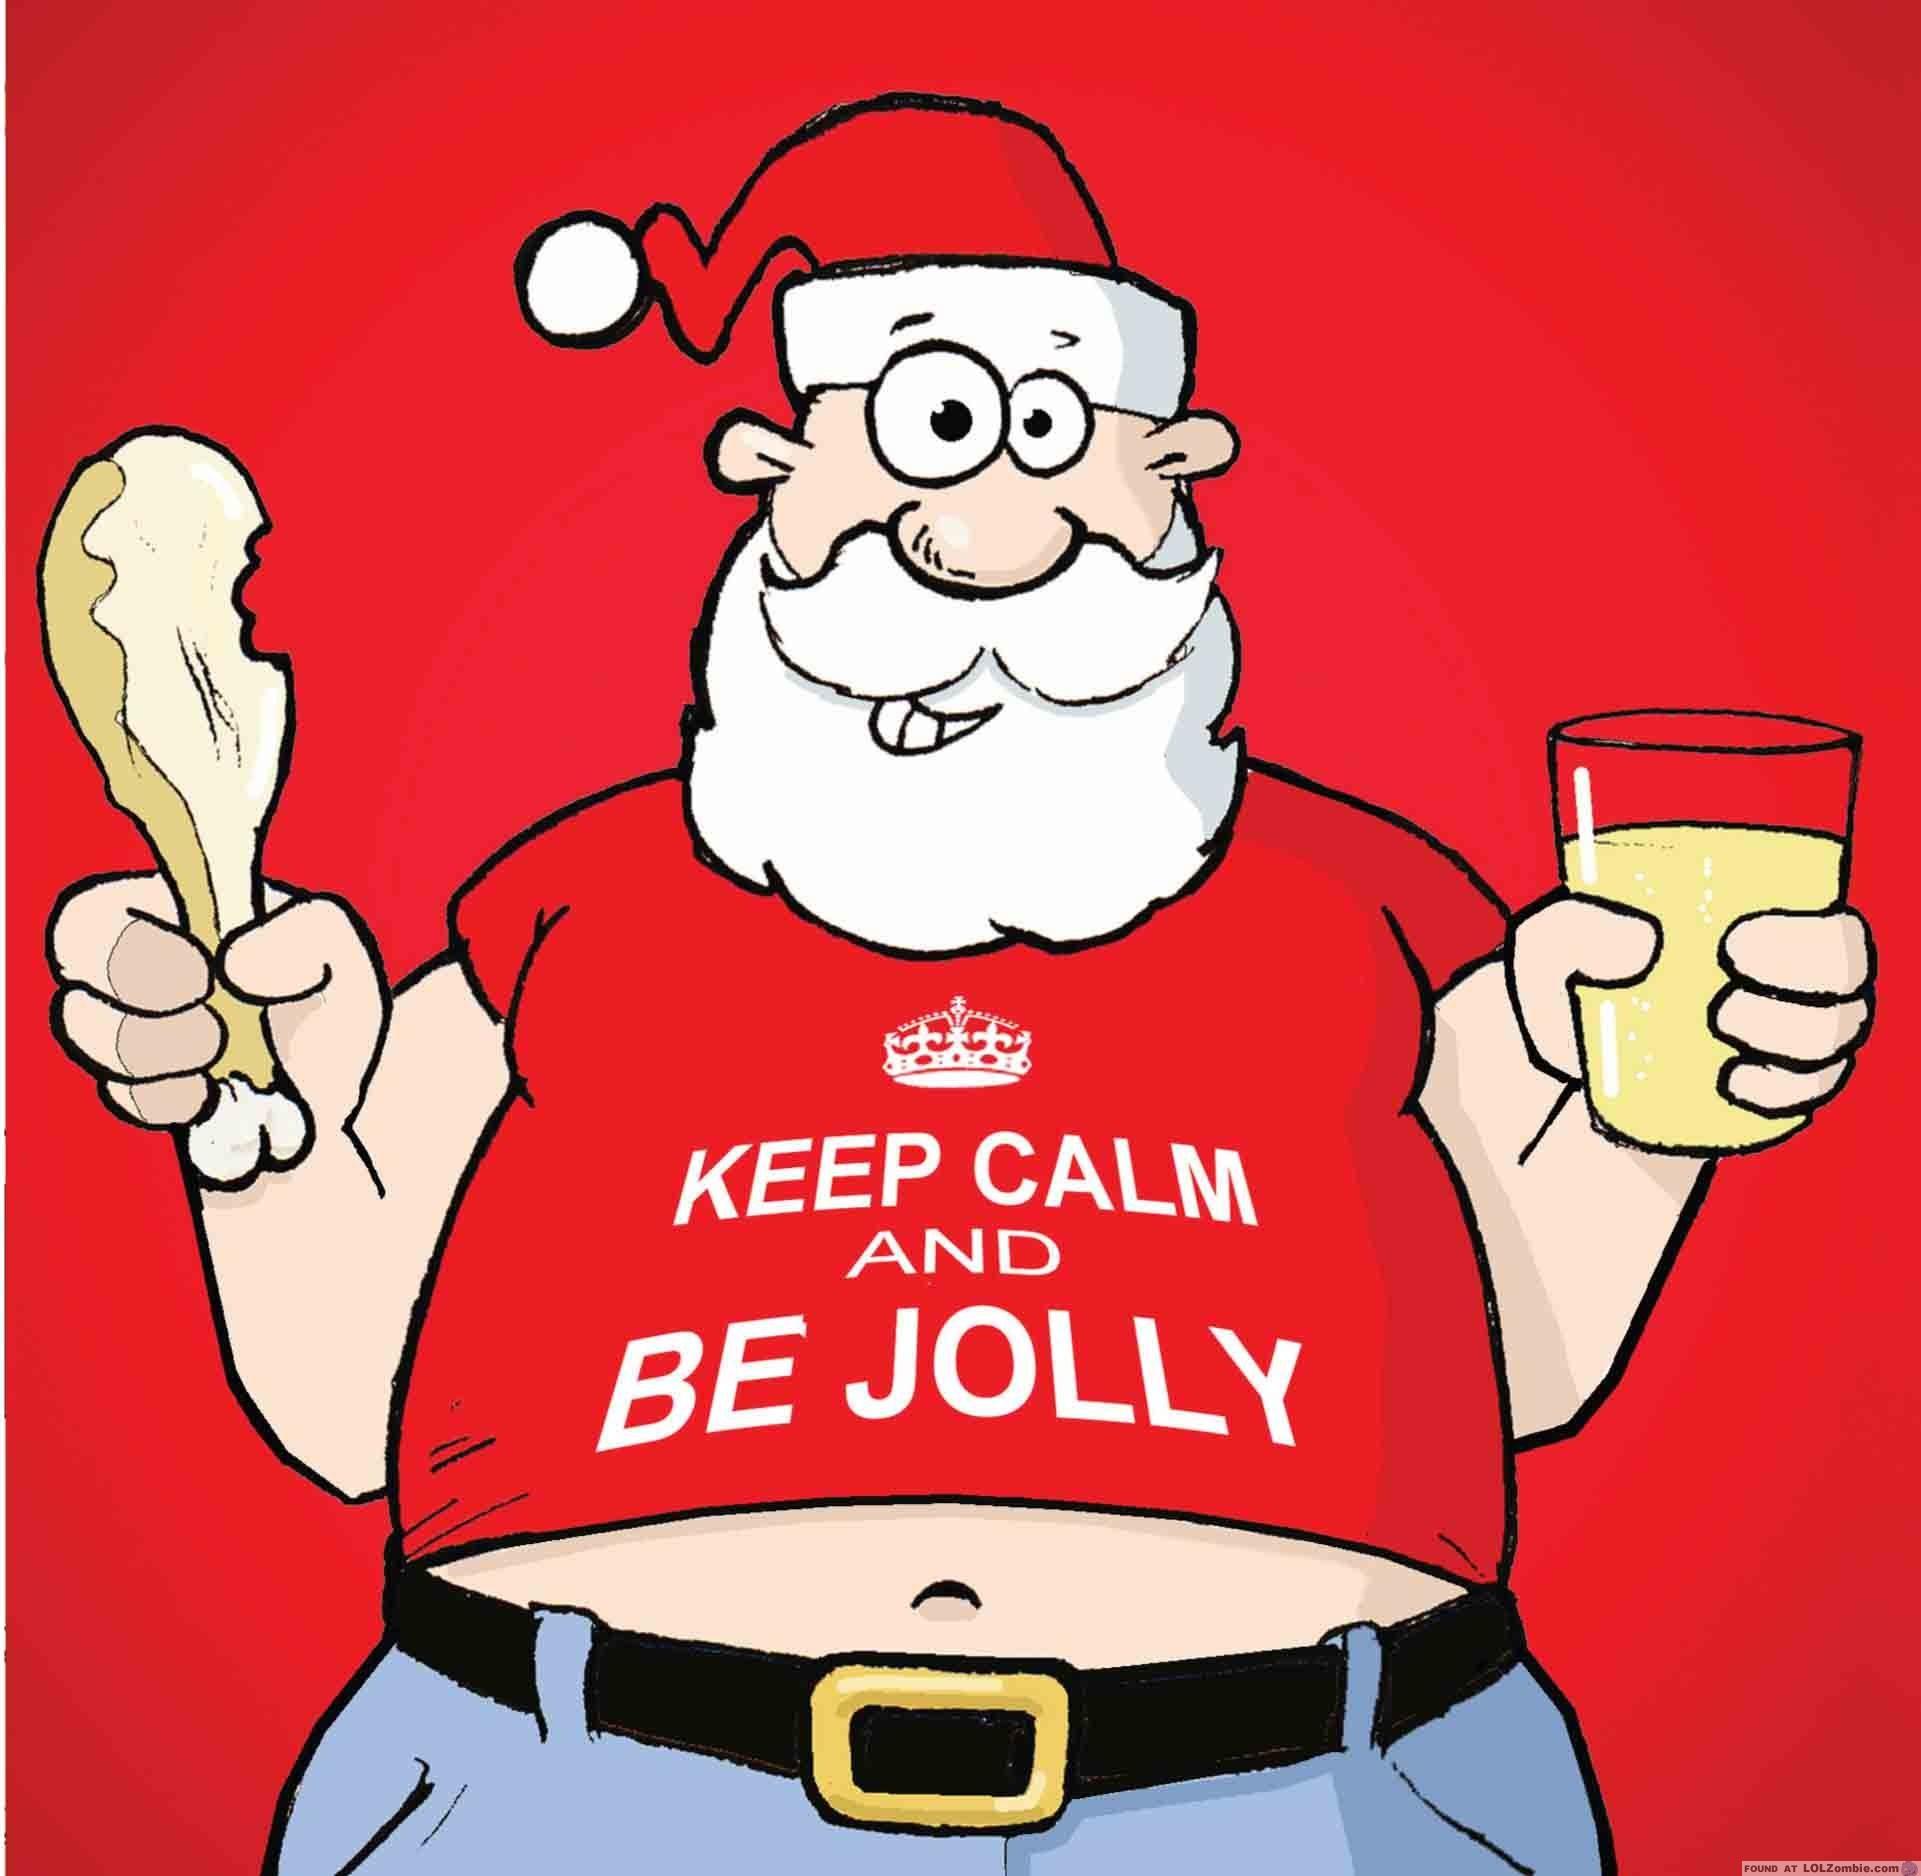 Santa holding a turkey leg and drink